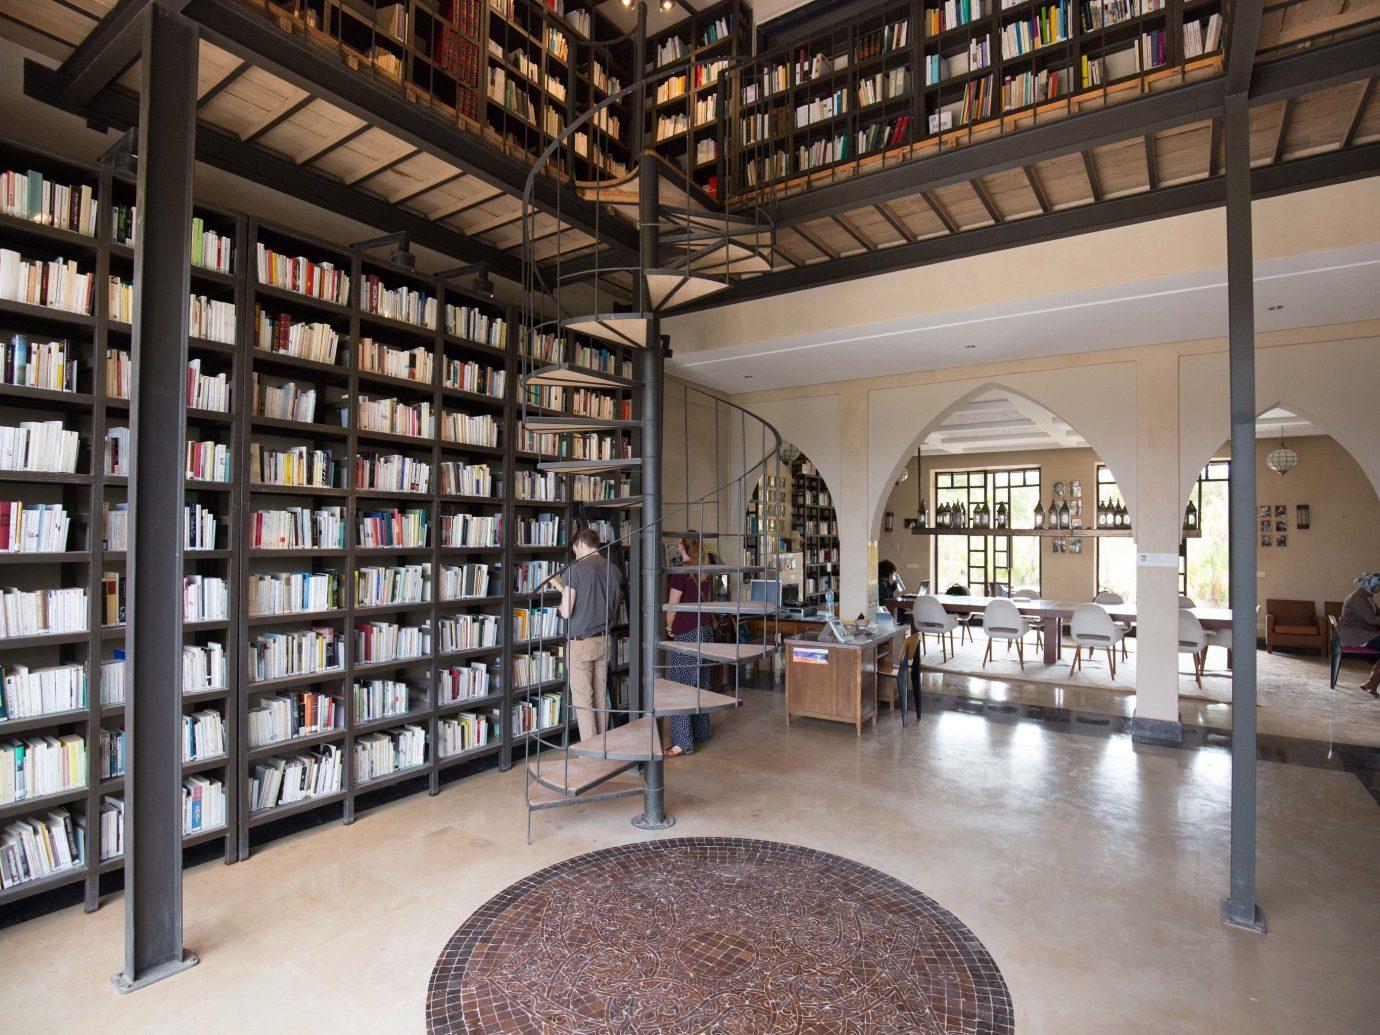 Hotels Solo Travel floor indoor library building public library interior design room tourist attraction retail